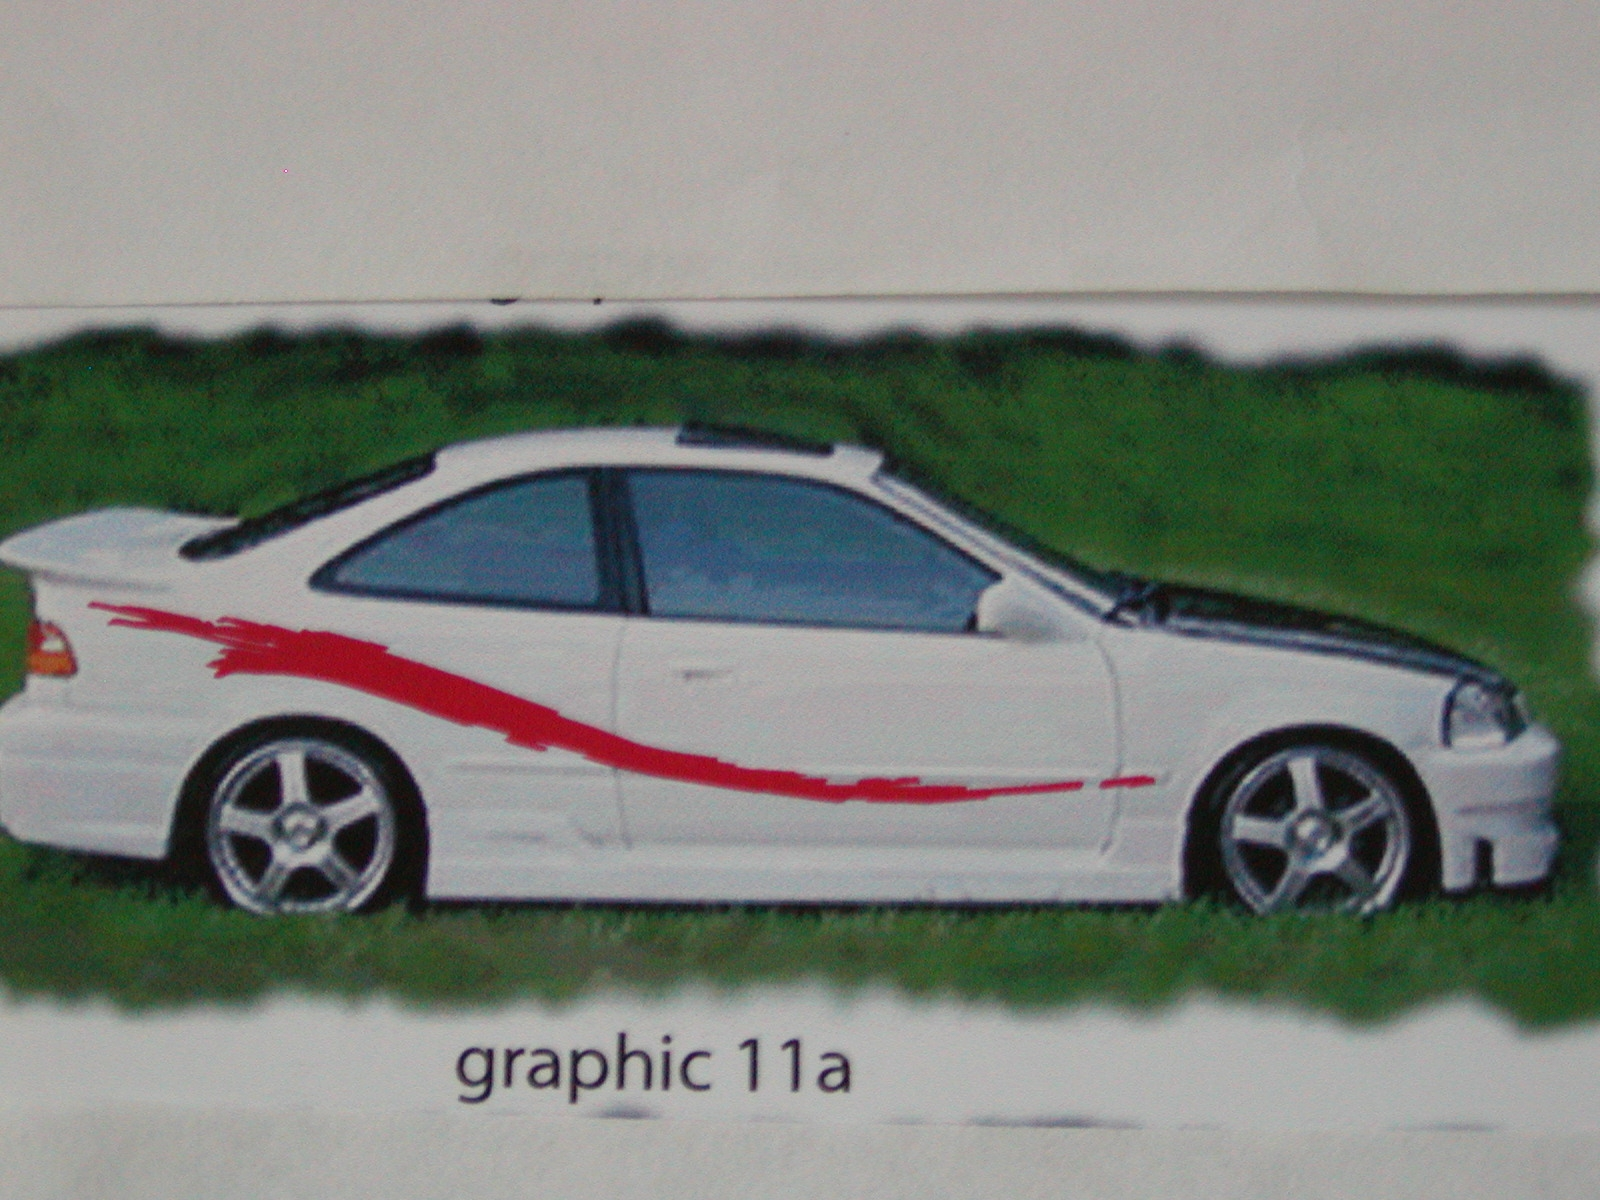 "�Graphics set 11a size 22"" tall X 110 long"